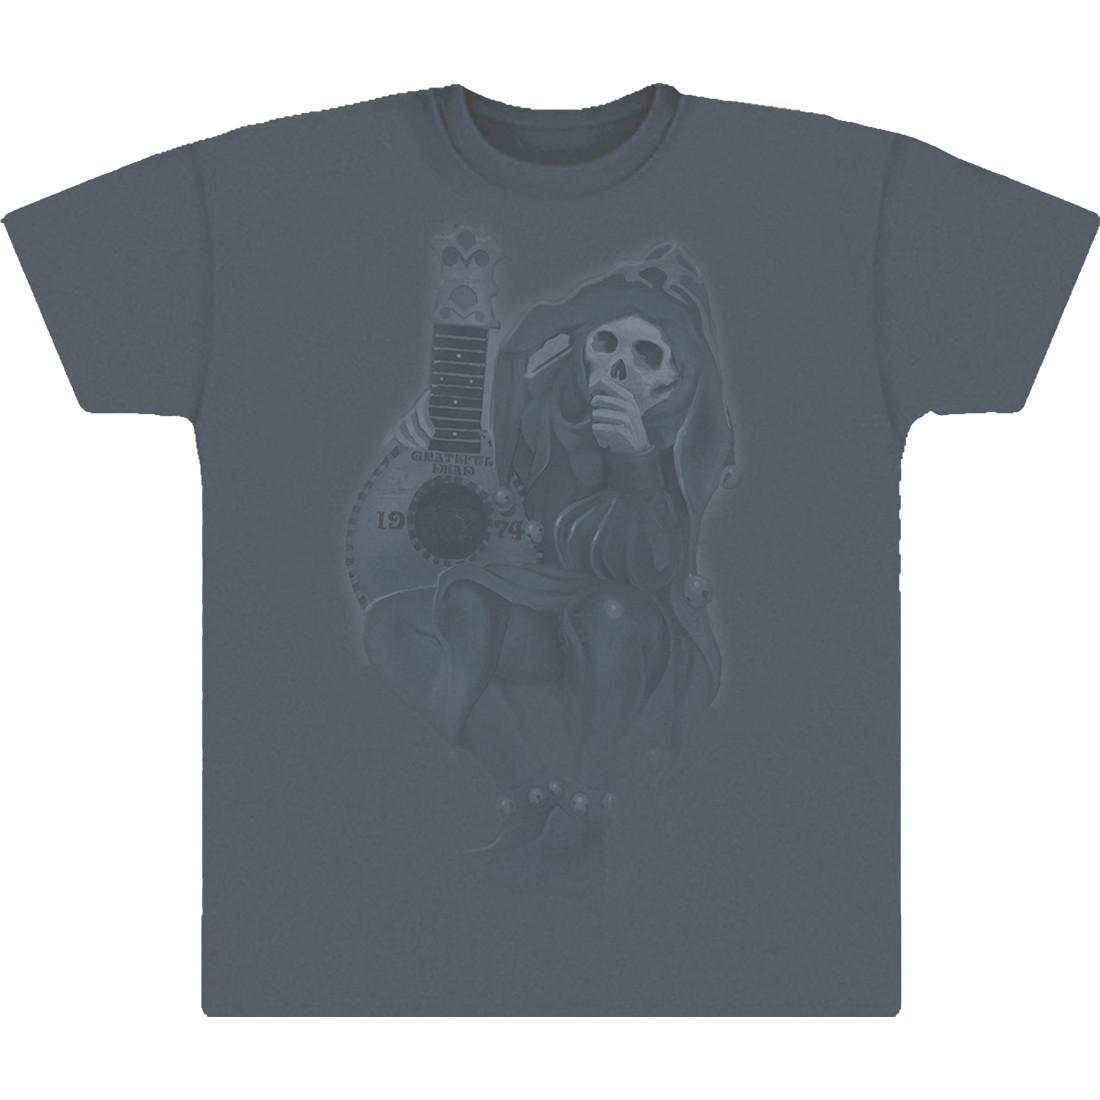 GD Jester Grey T-Shirt